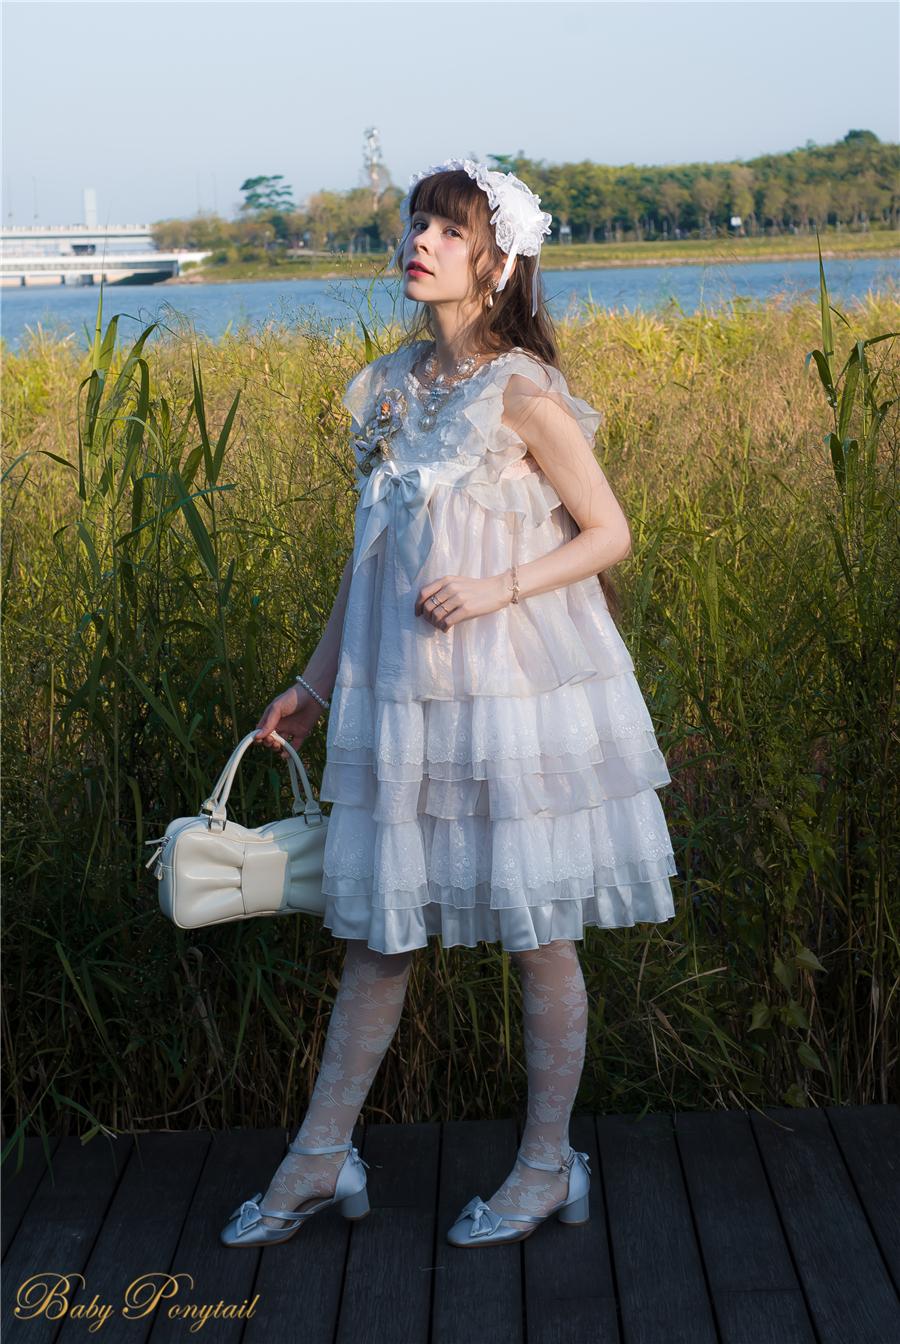 BabyPonytail_modelclaudia_Present Angel White JSK park05.jpg